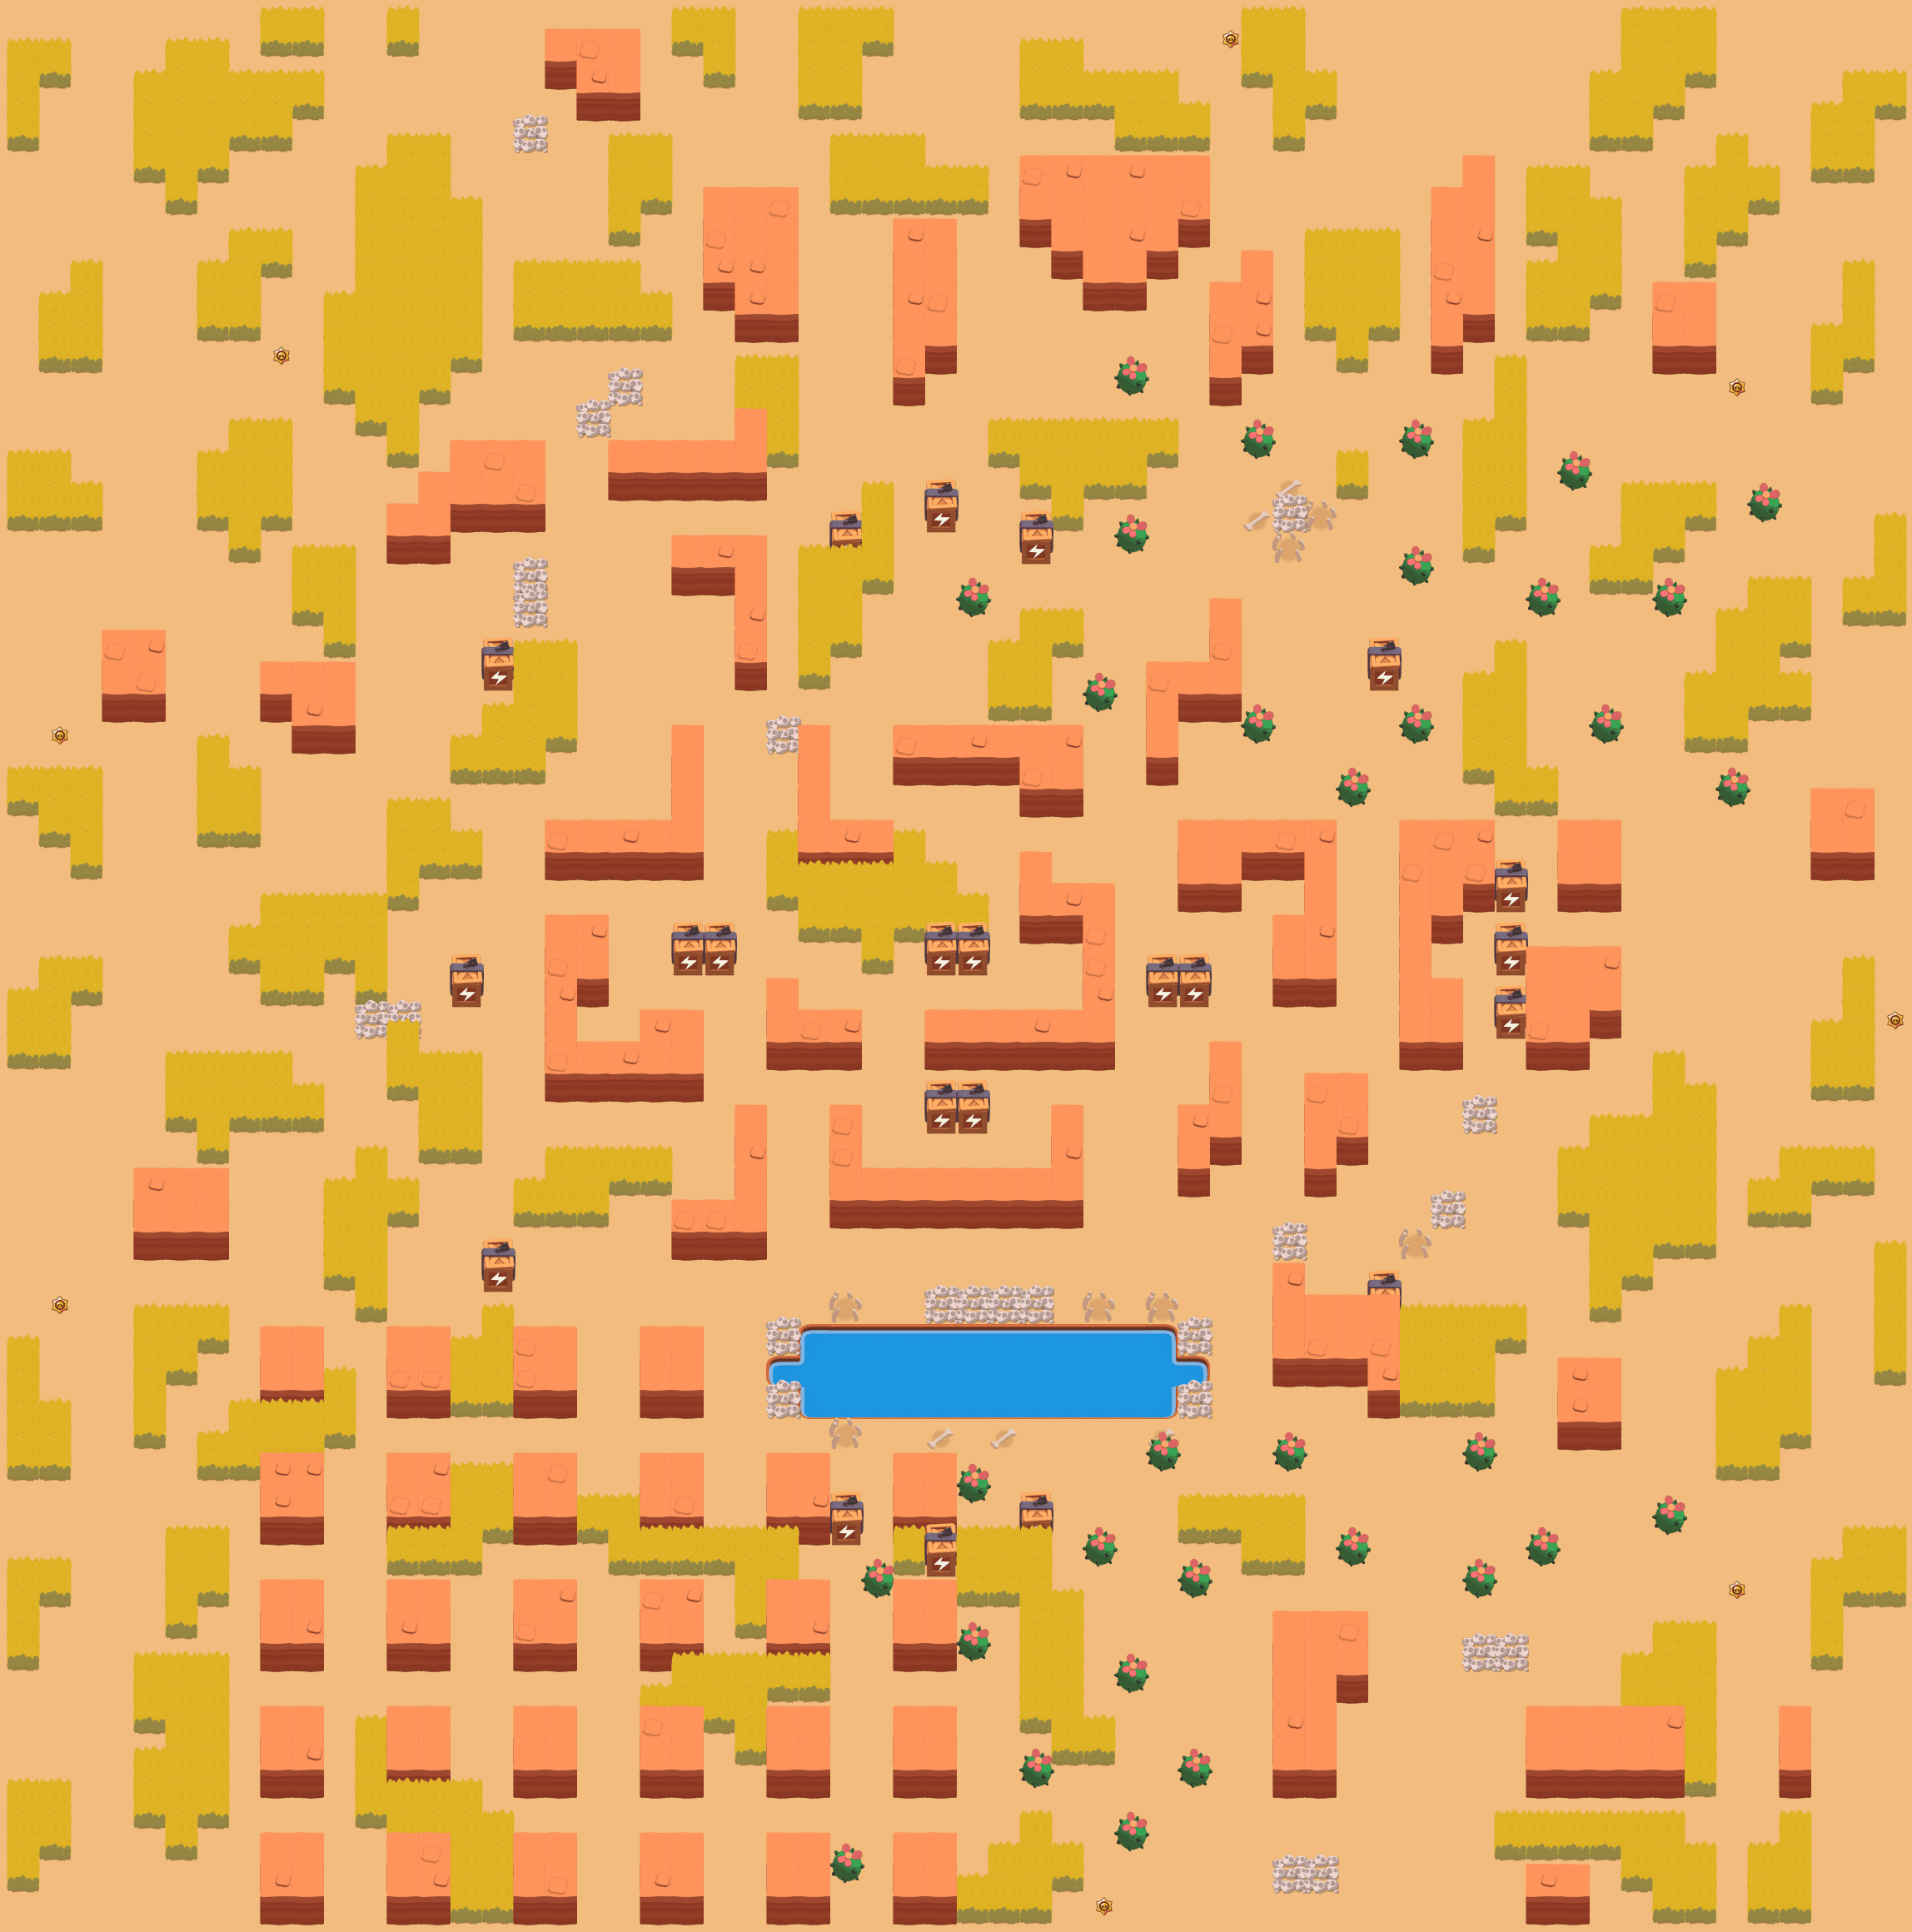 Карта SKULL CREEK в режиме Конфронтация (Showdown)